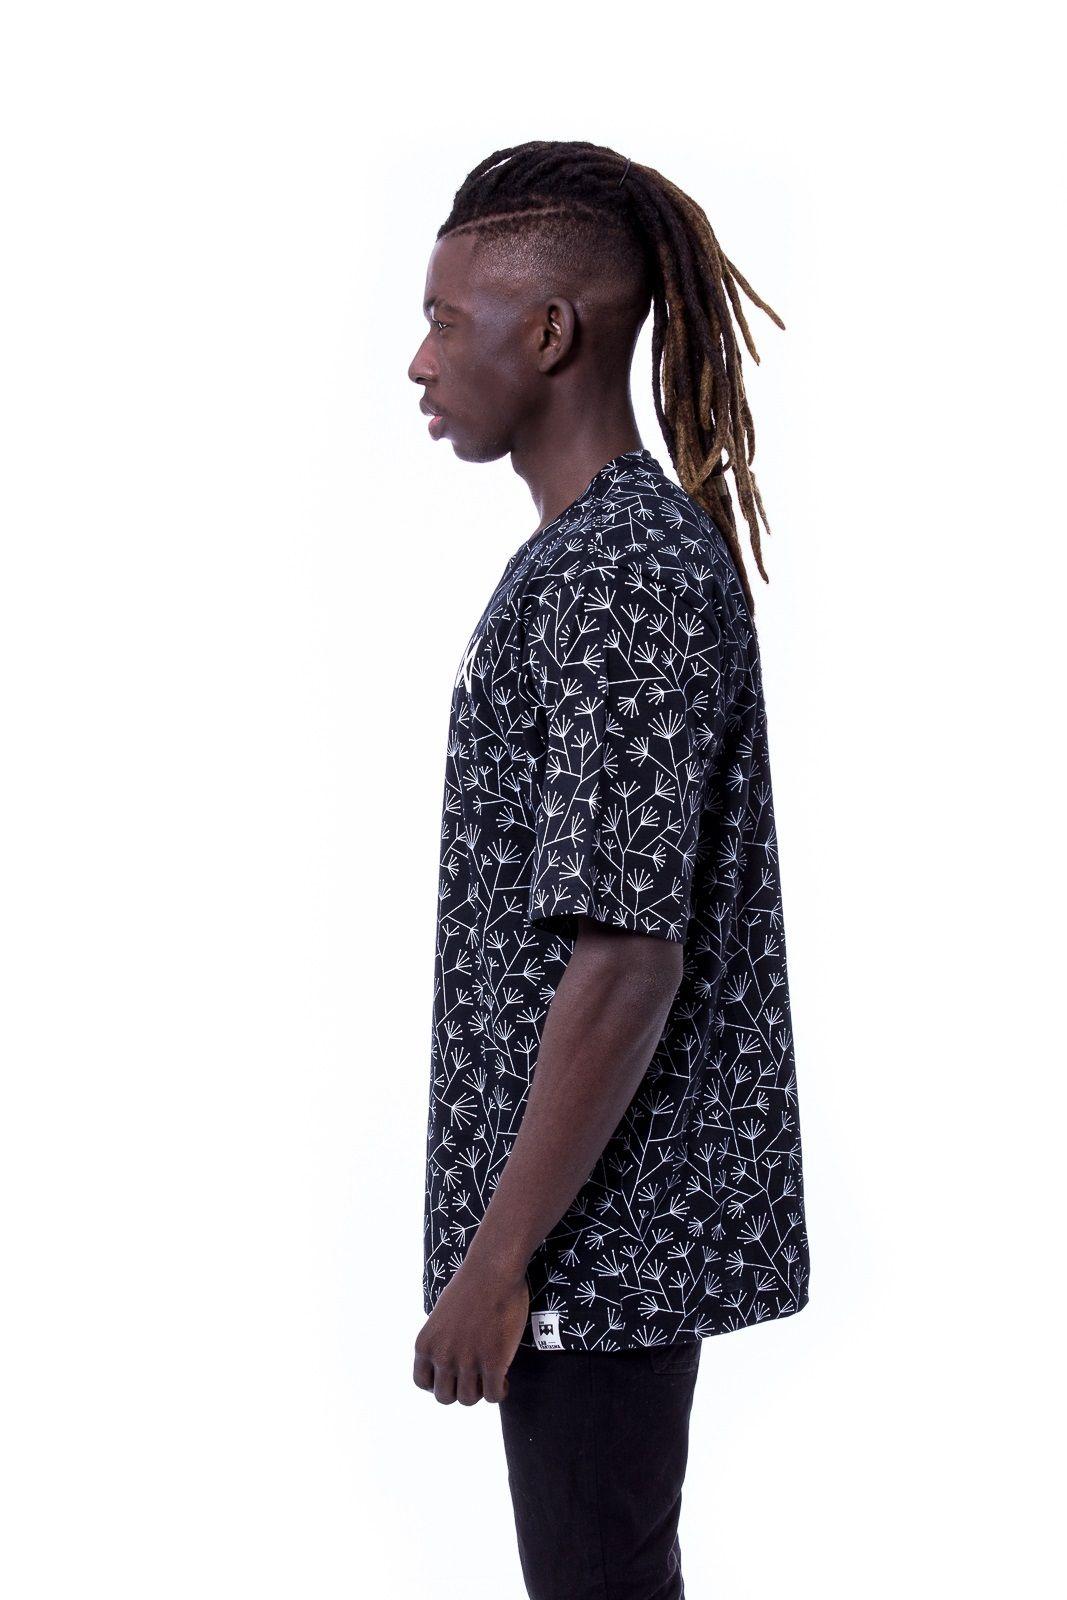 Camiseta Básica Emicida Preta